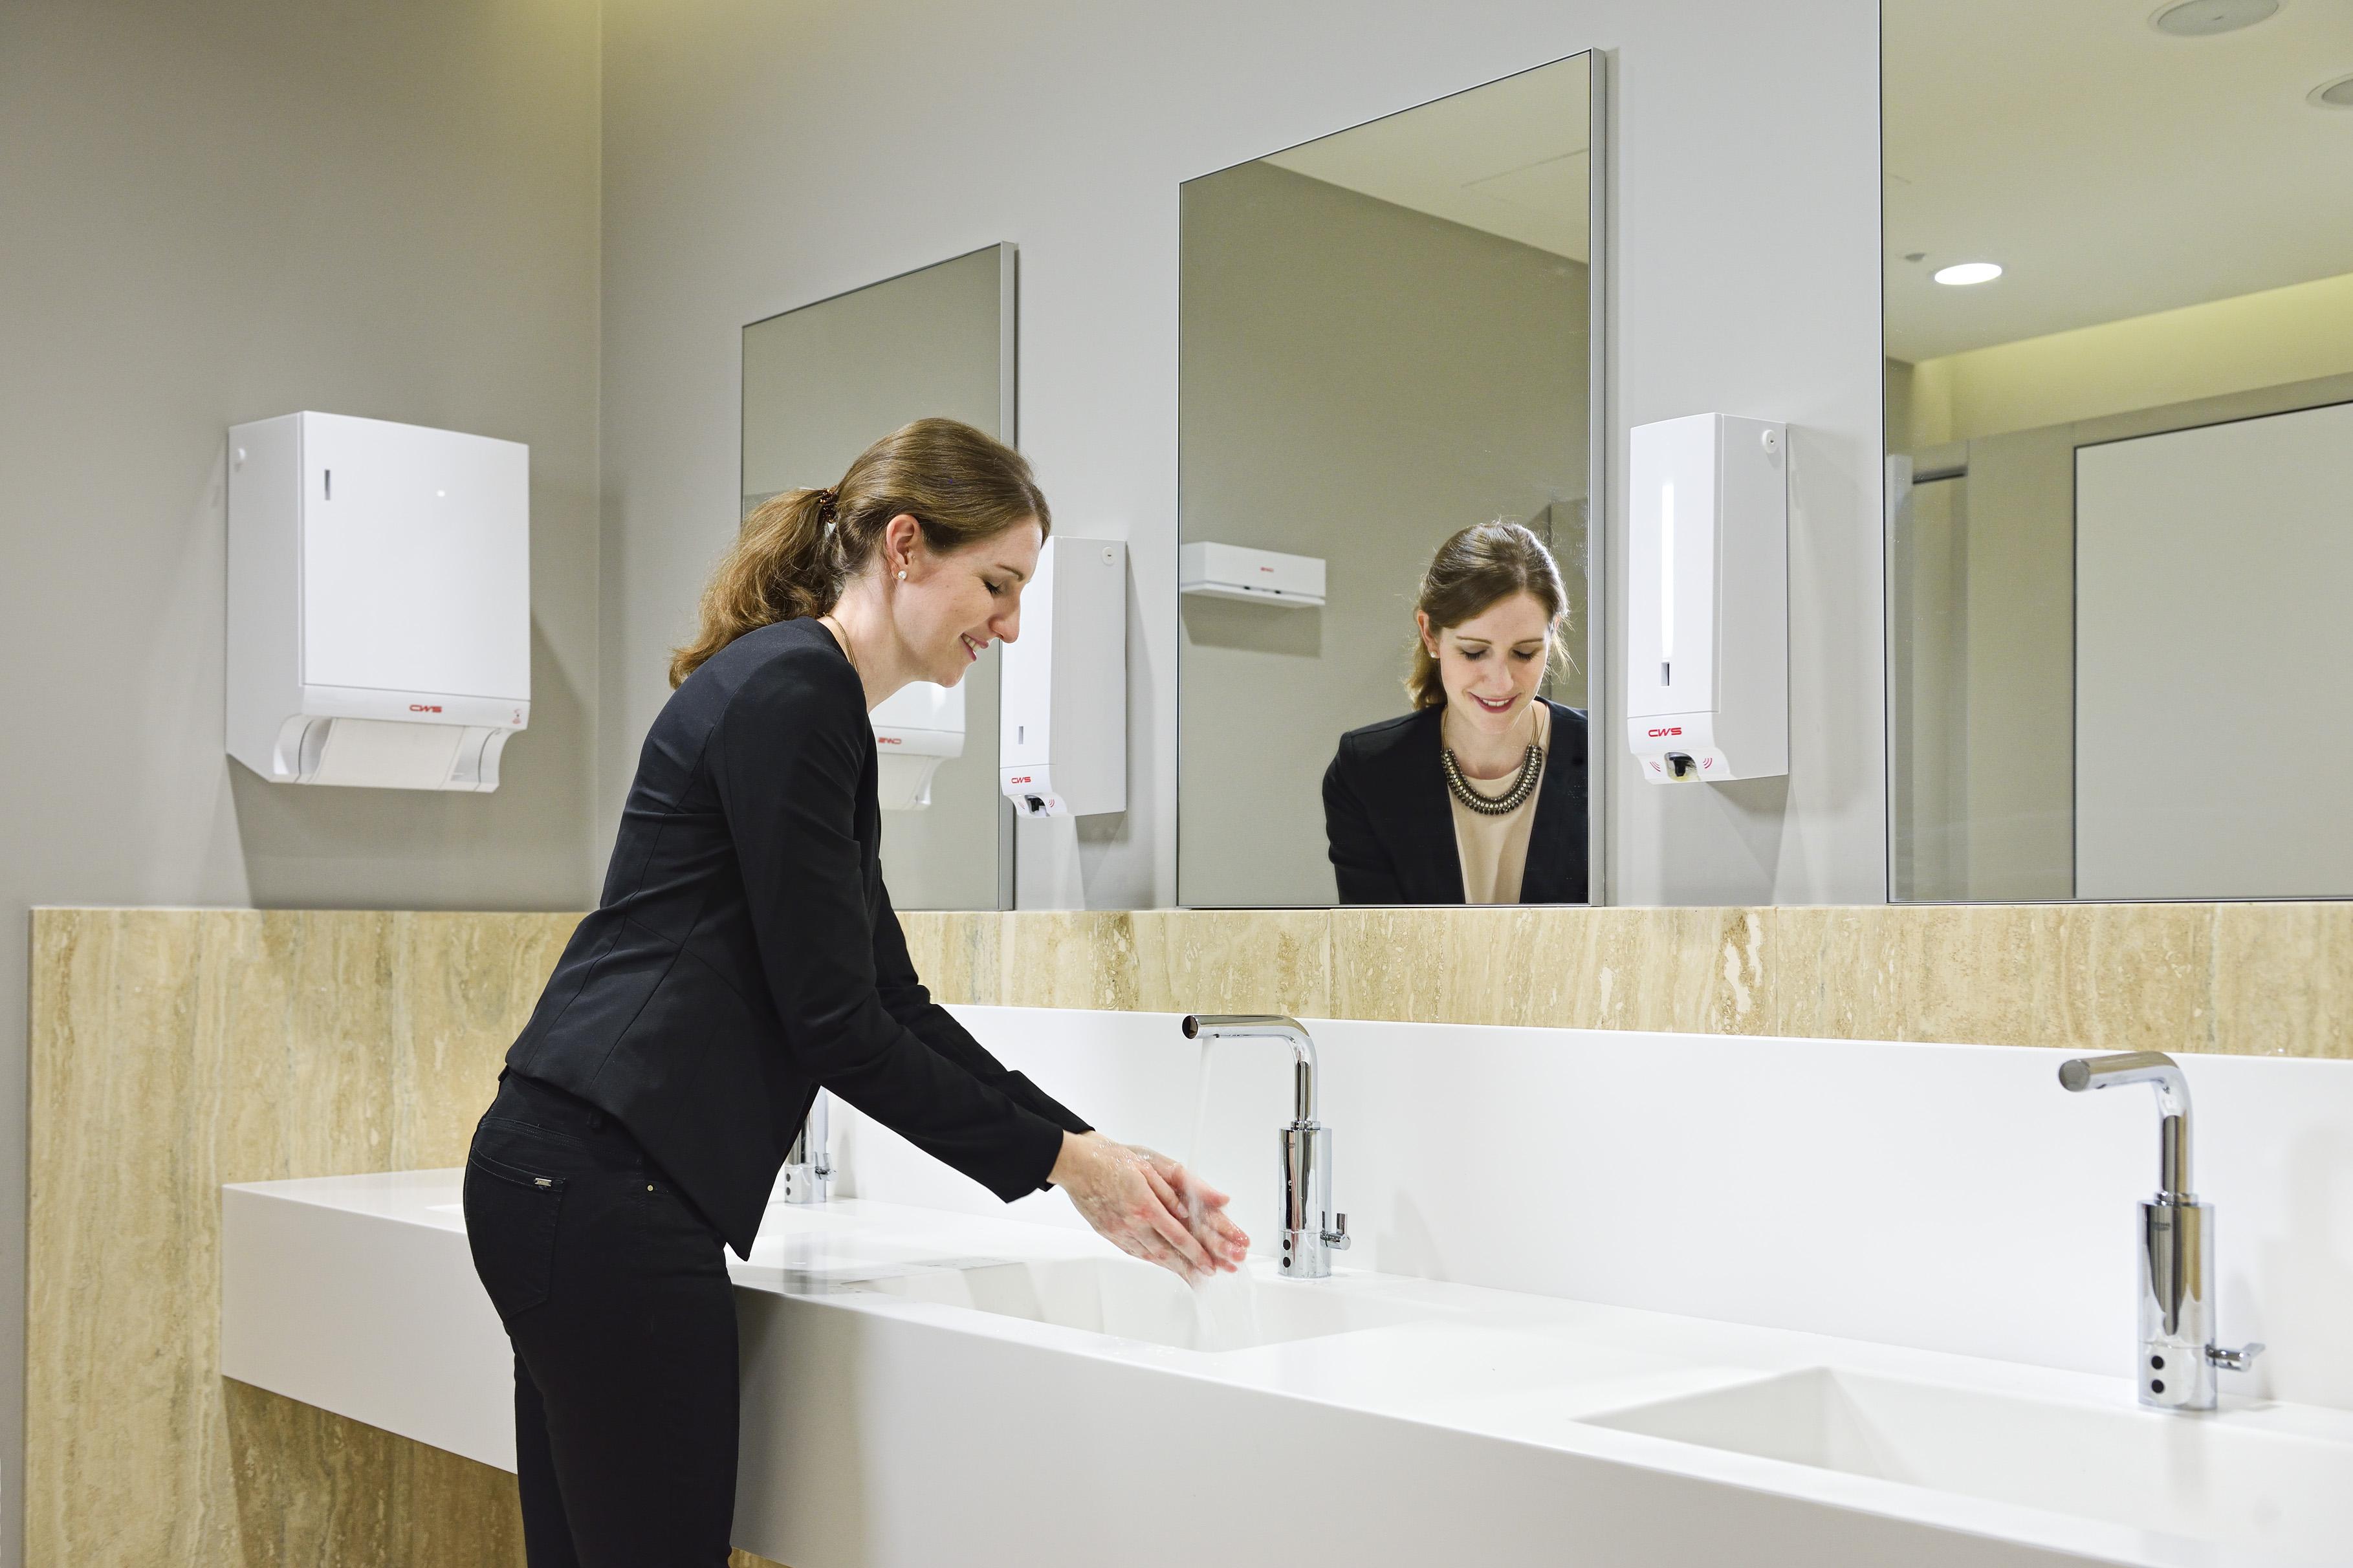 loovio-by-CWS-hand-washing-luxury-washroom